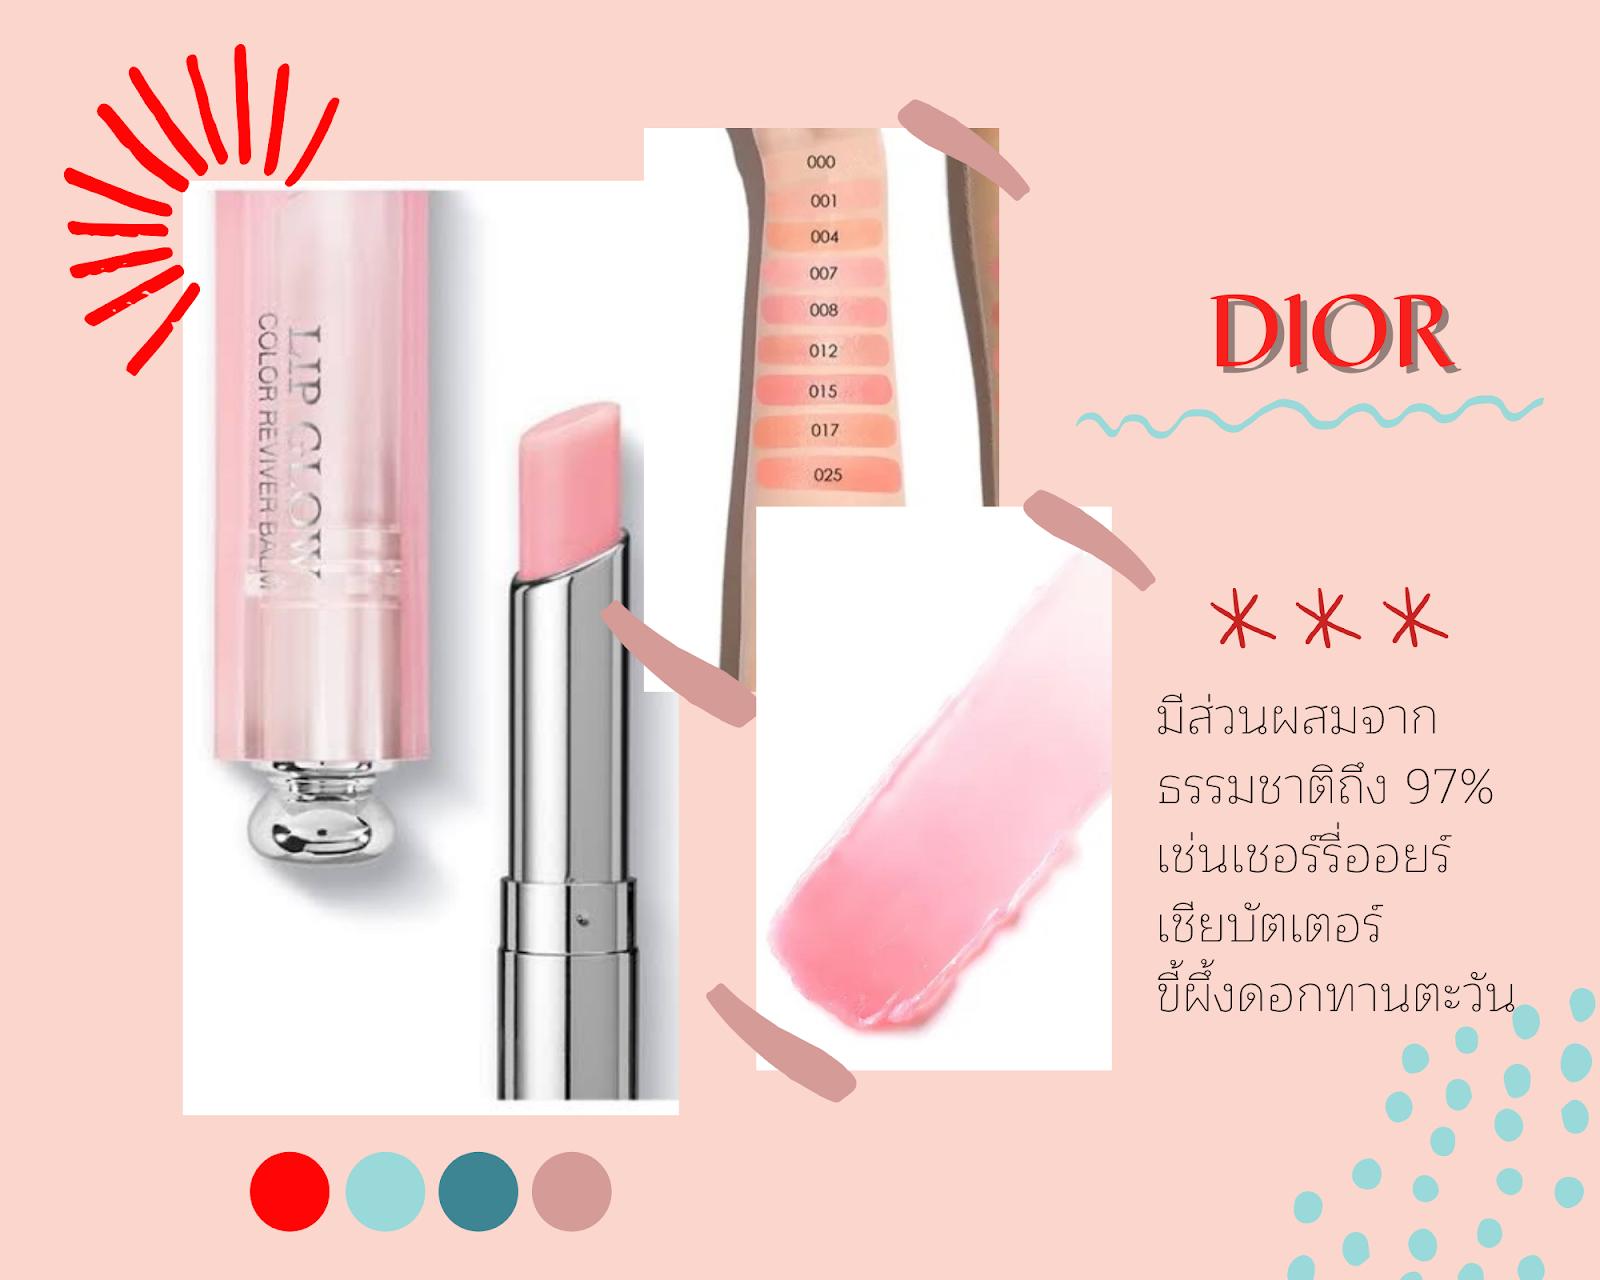 5. Dior Addict Lip Glow Color